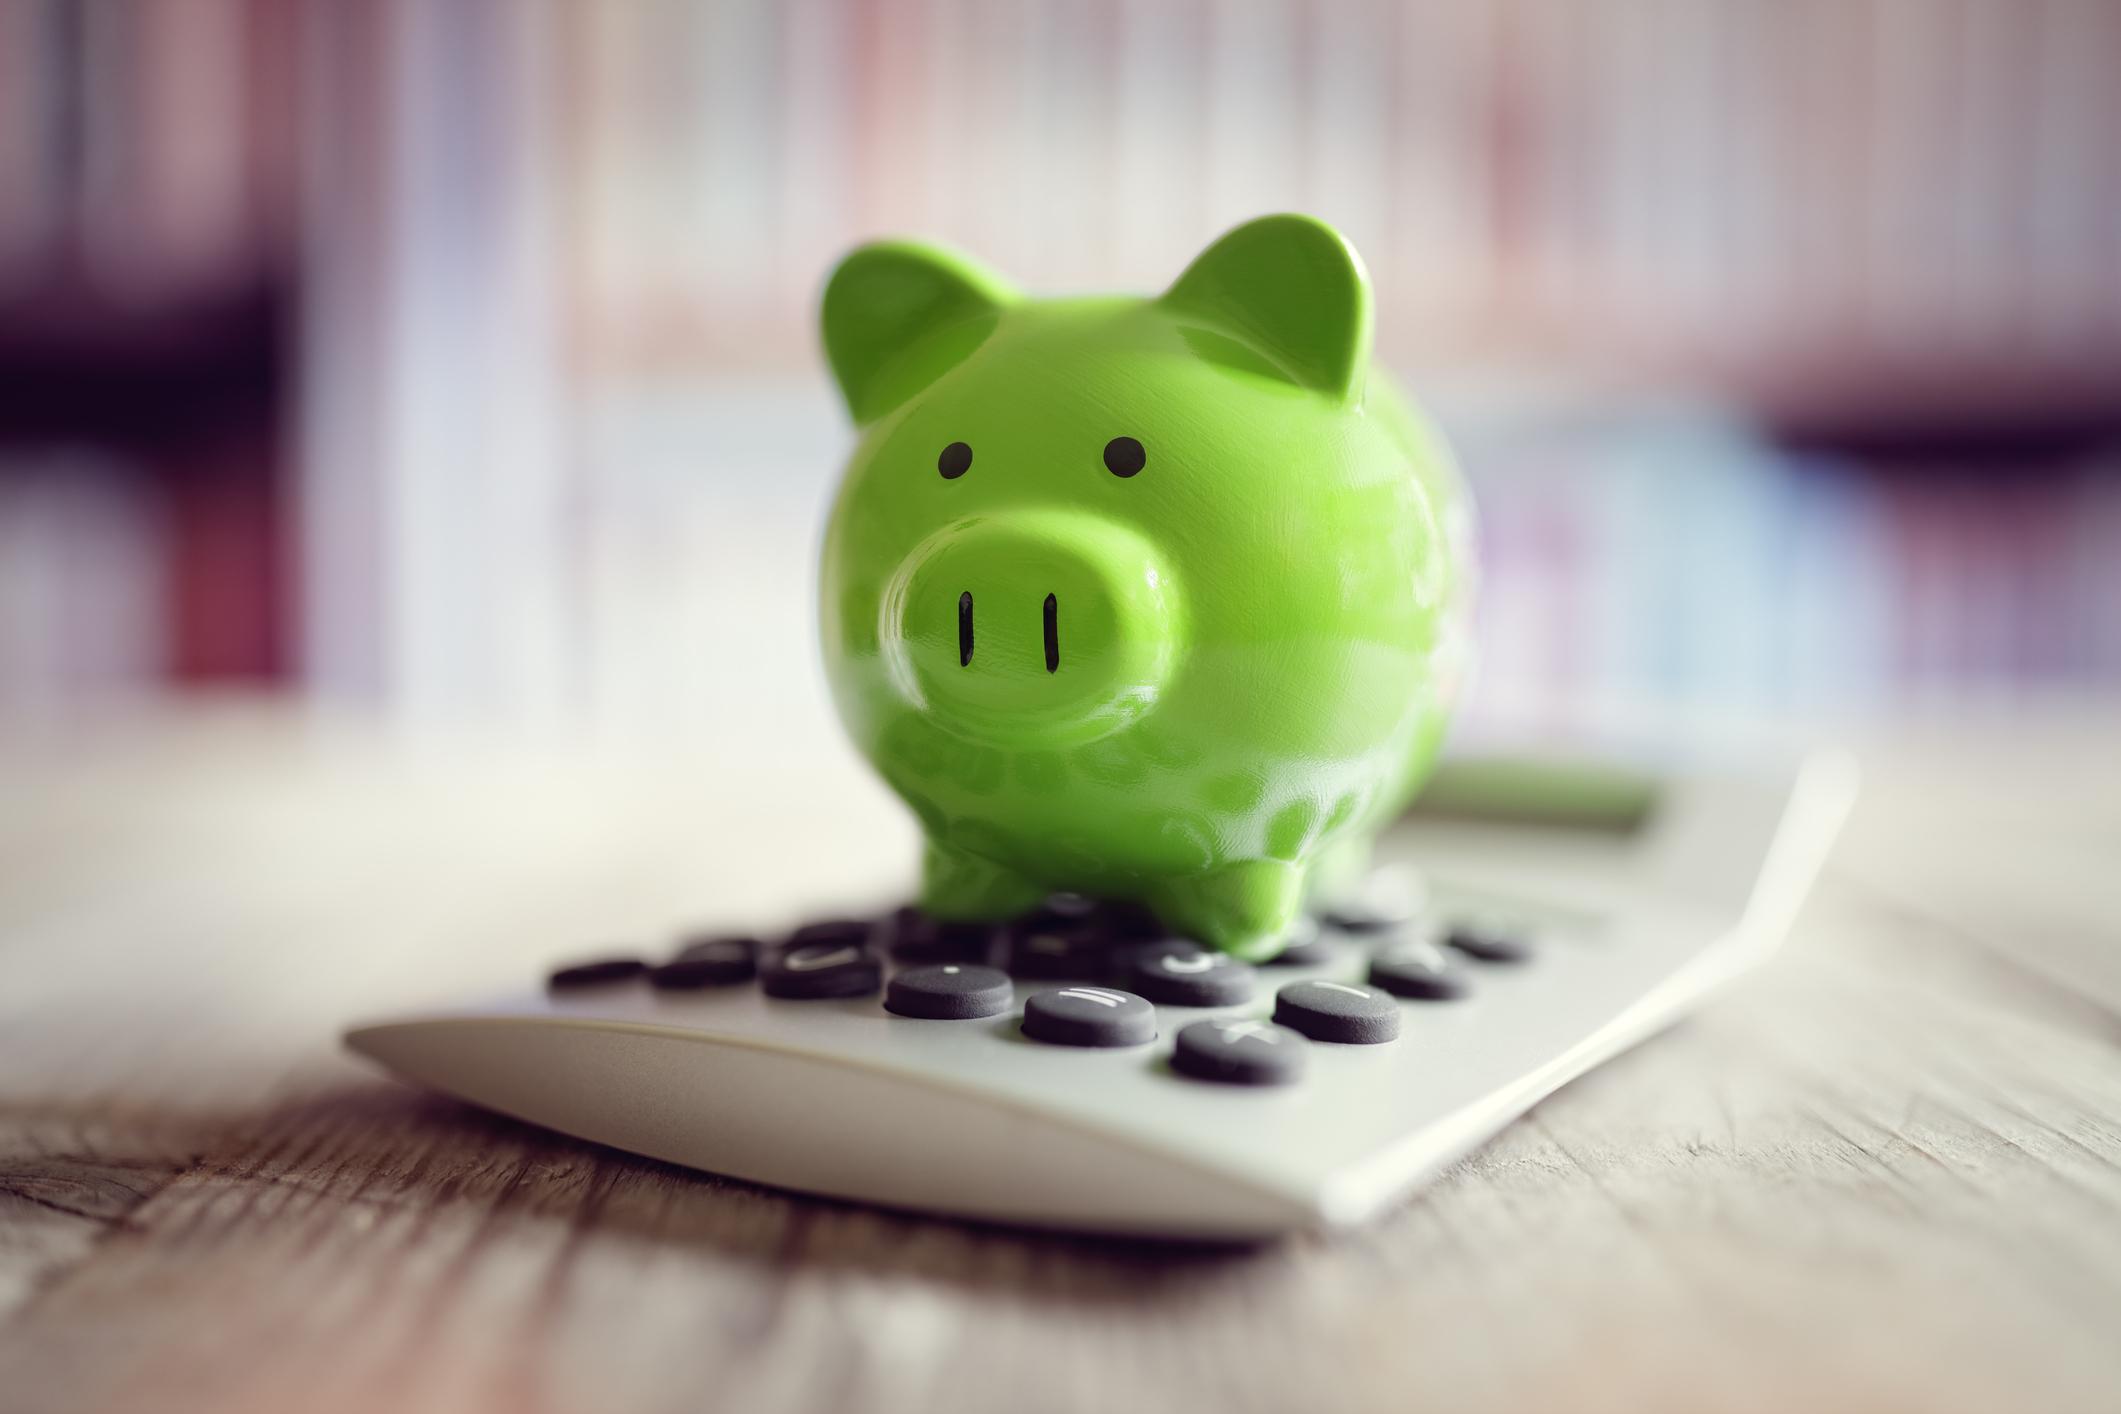 A green piggy bank sits atop a calculator on a wooden surface.